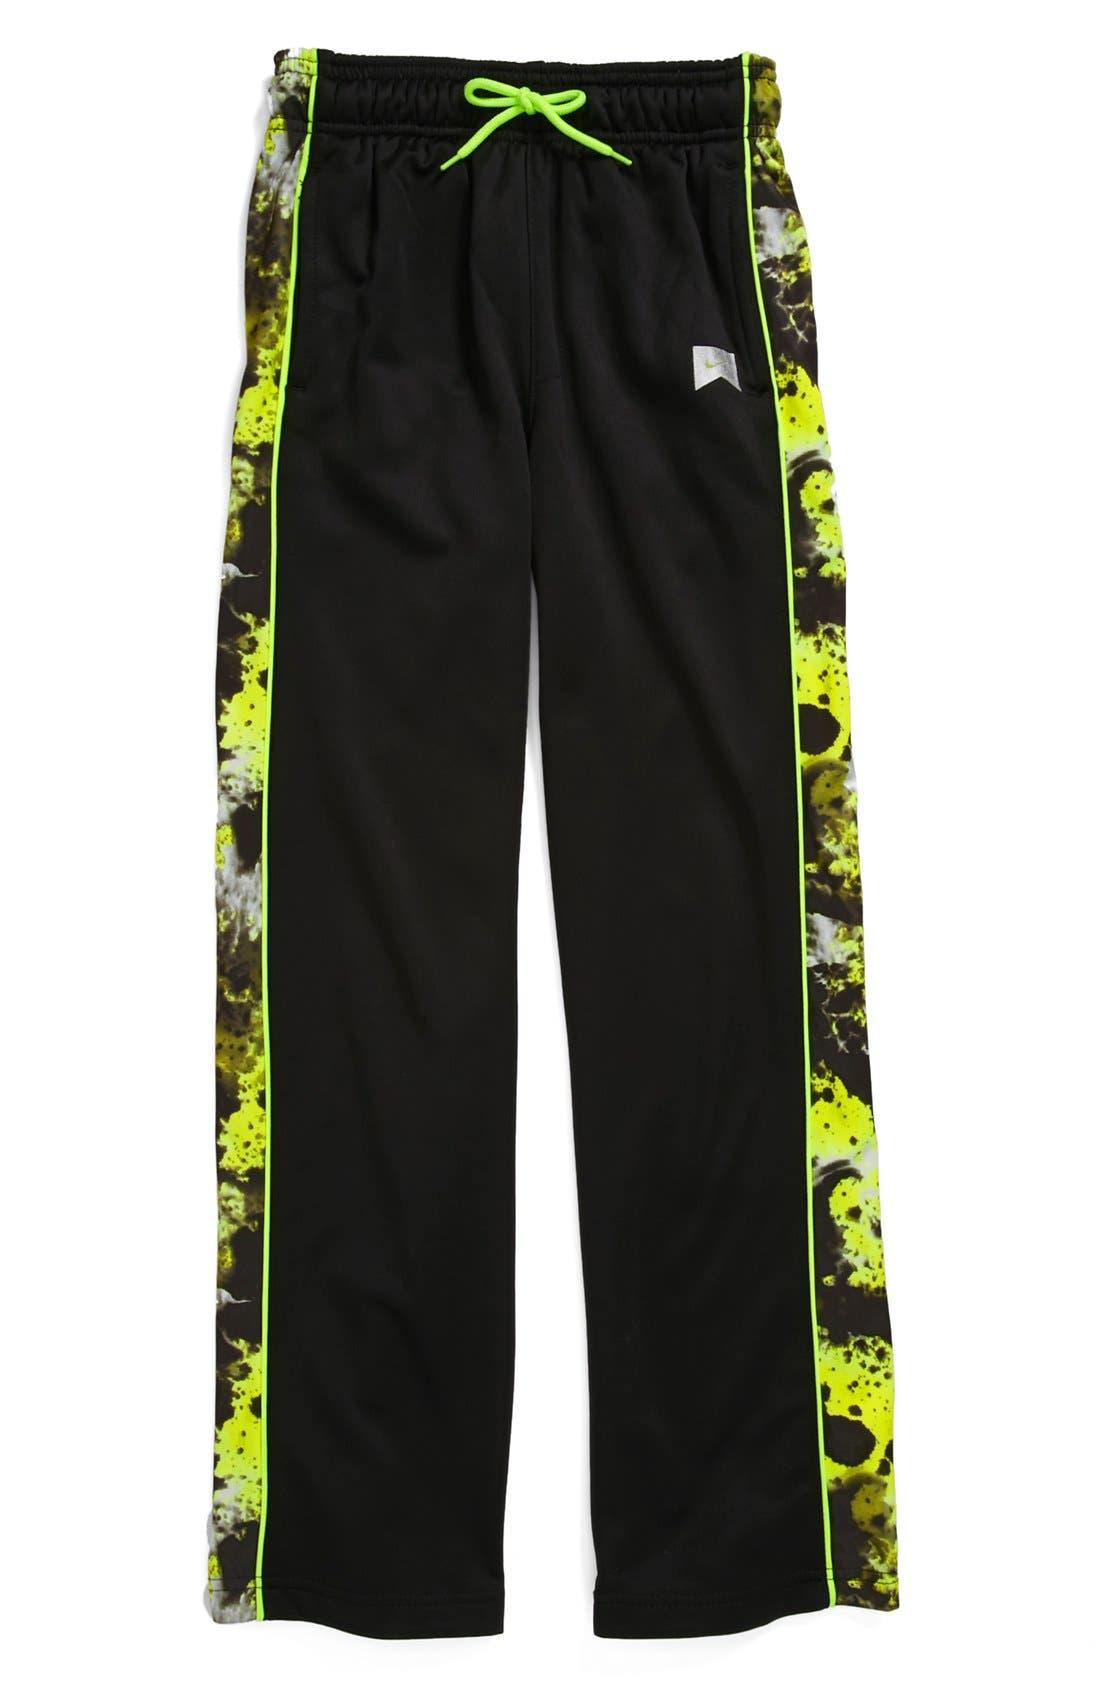 Alternate Image 1 Selected - Nike 'Therma-FIT' Pants (Big Boys)